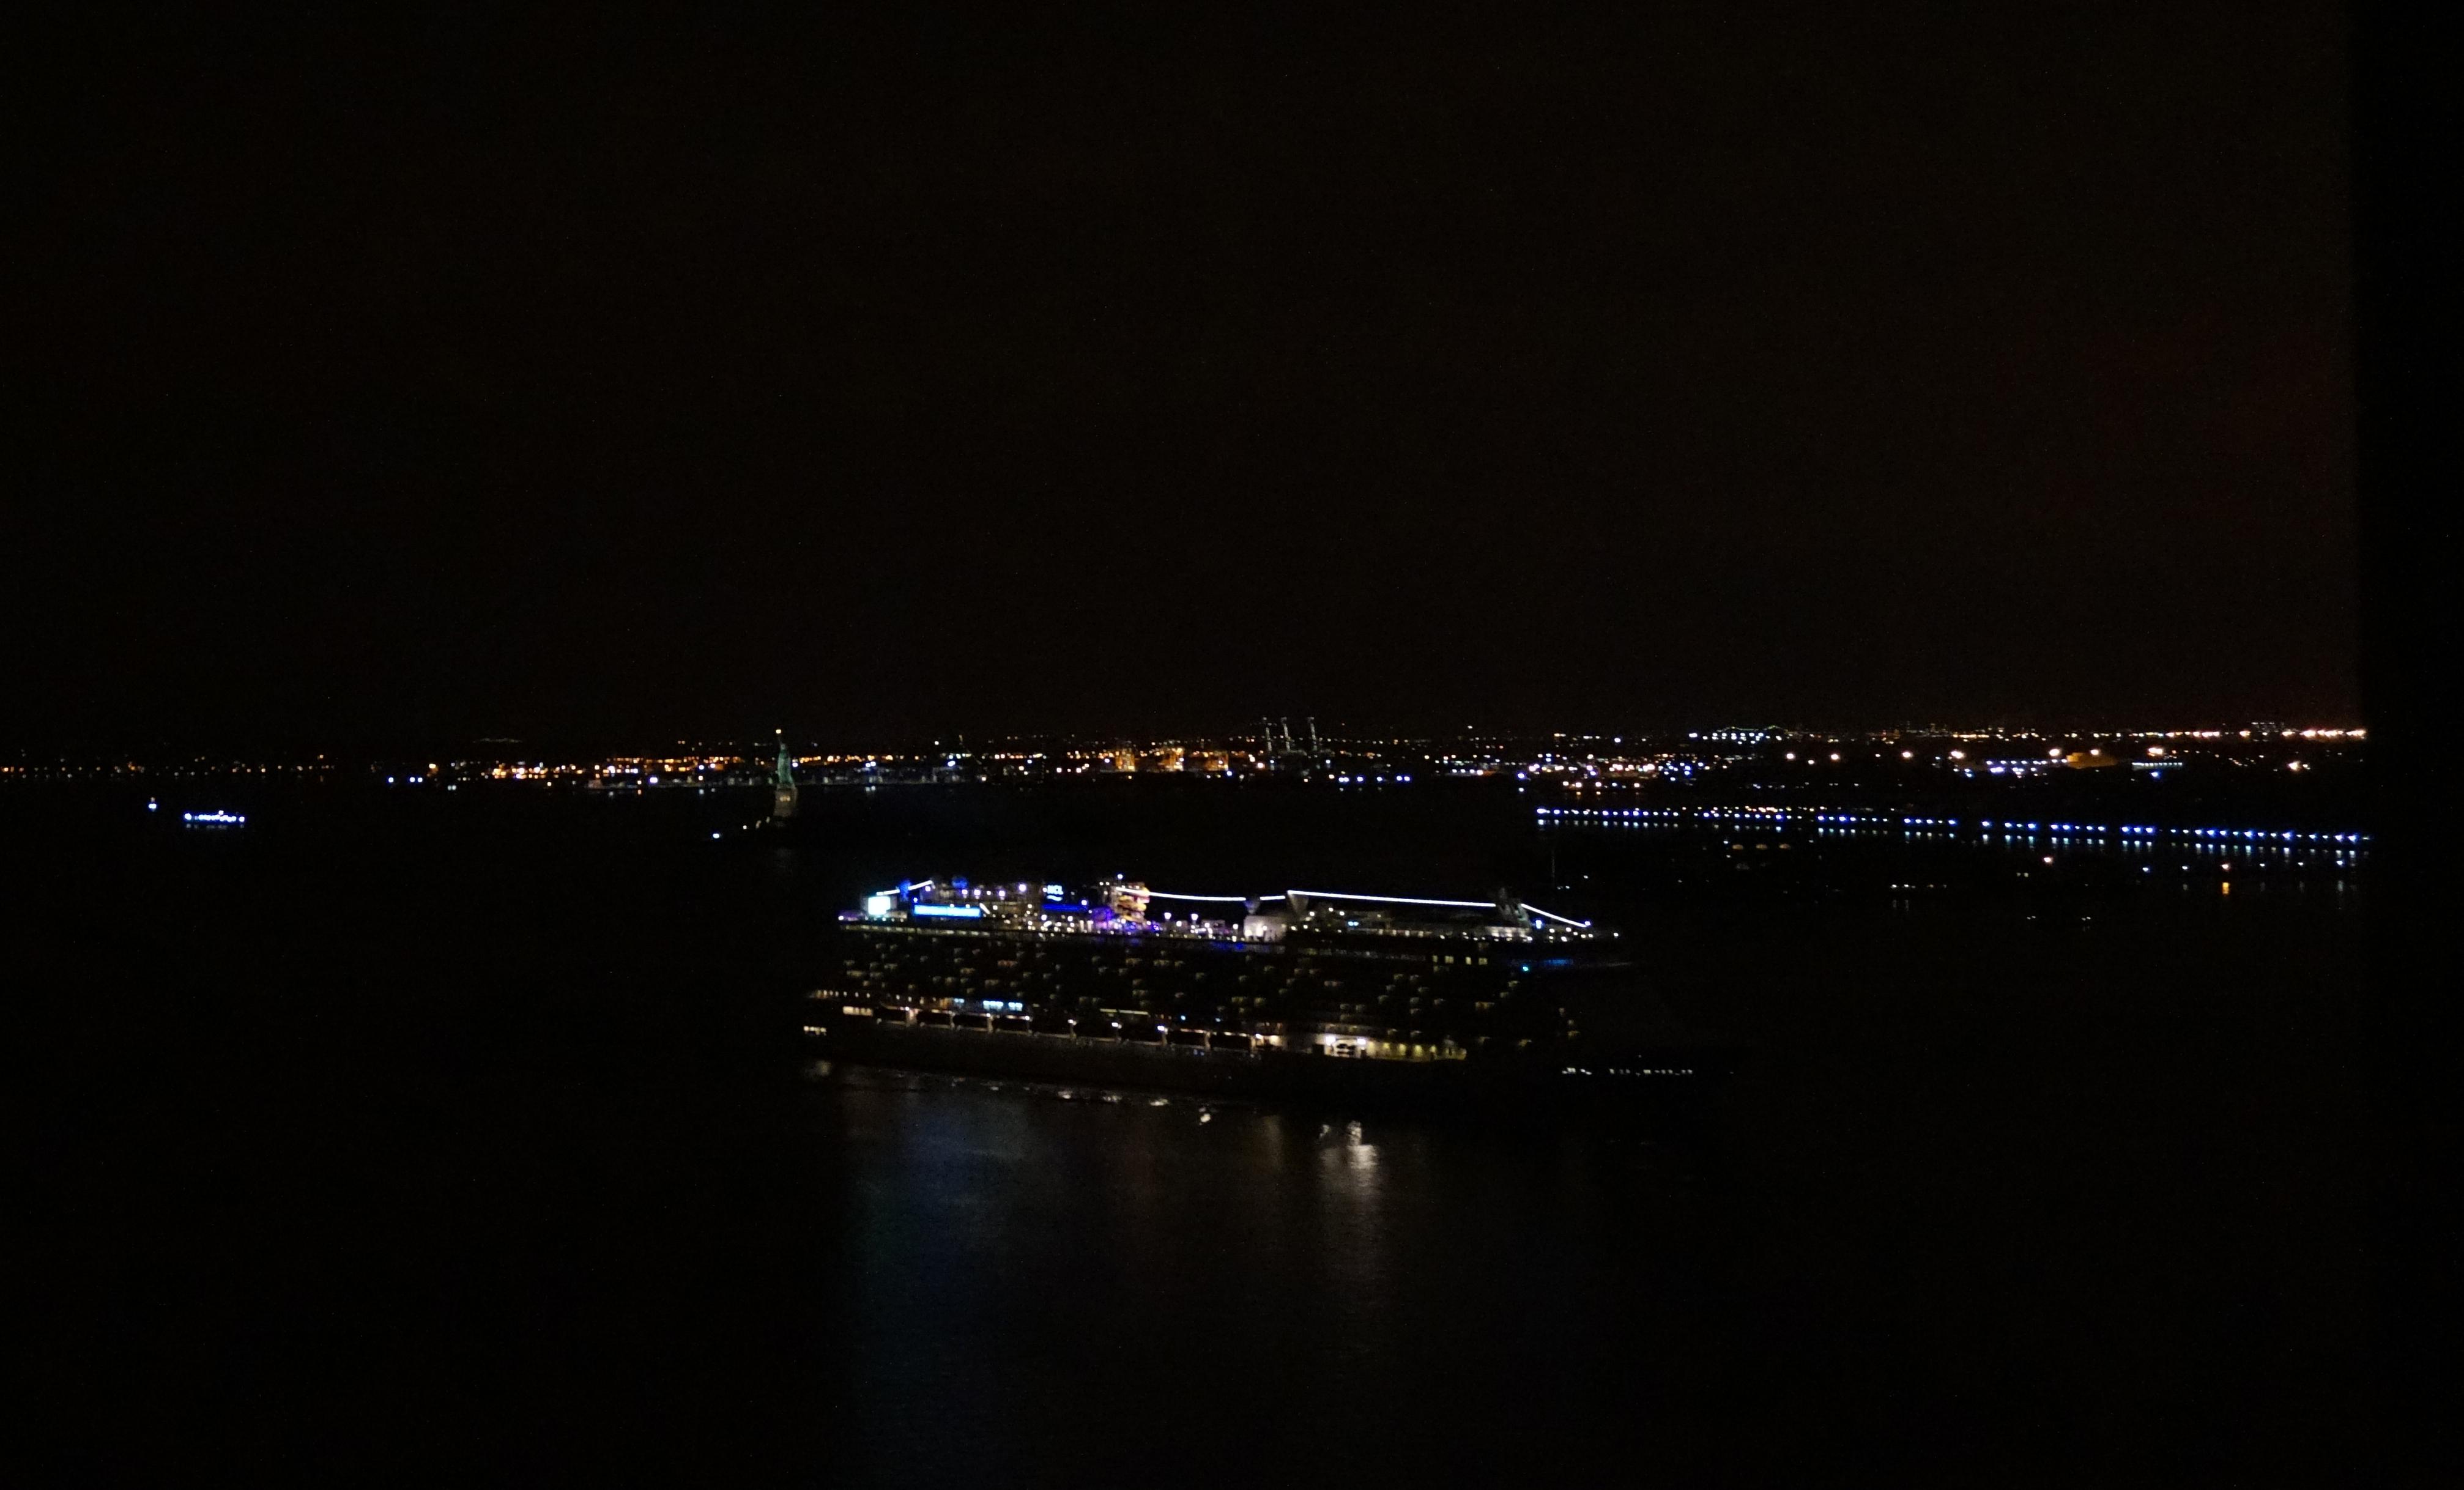 Cruise ship entiering port 8-31-2014